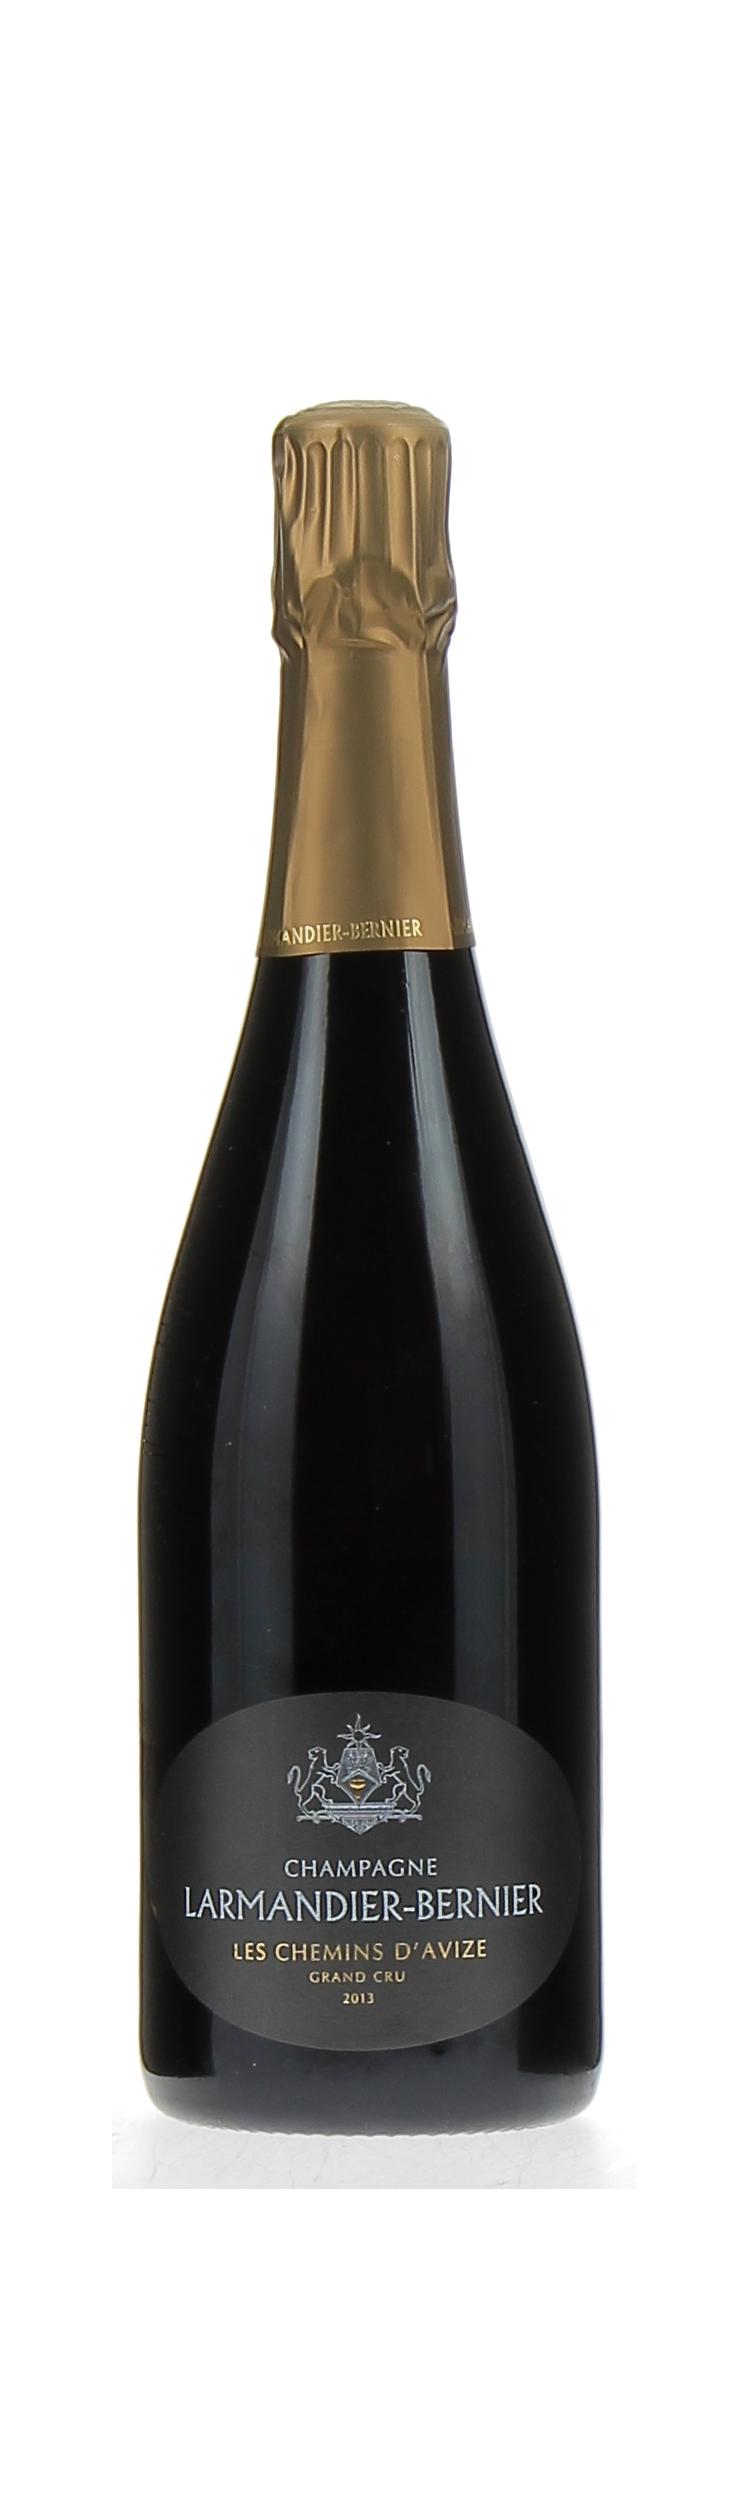 Champagne Larmandier-Bernier   Les Chemins d´Avize Grand Cru 2013